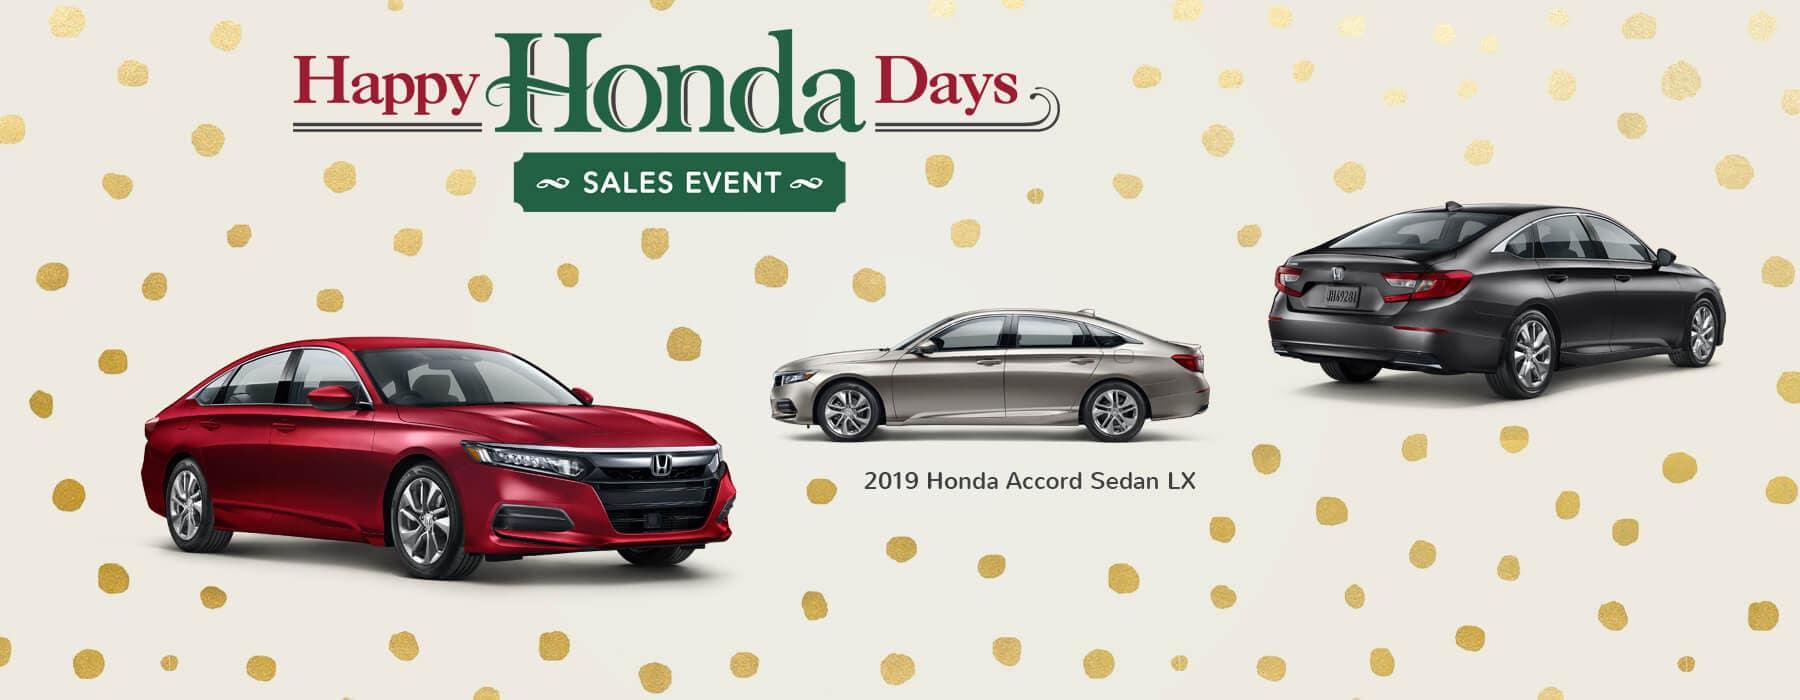 Happy Honda Days Sales Event 2019 Honda Accord Sedan Slider